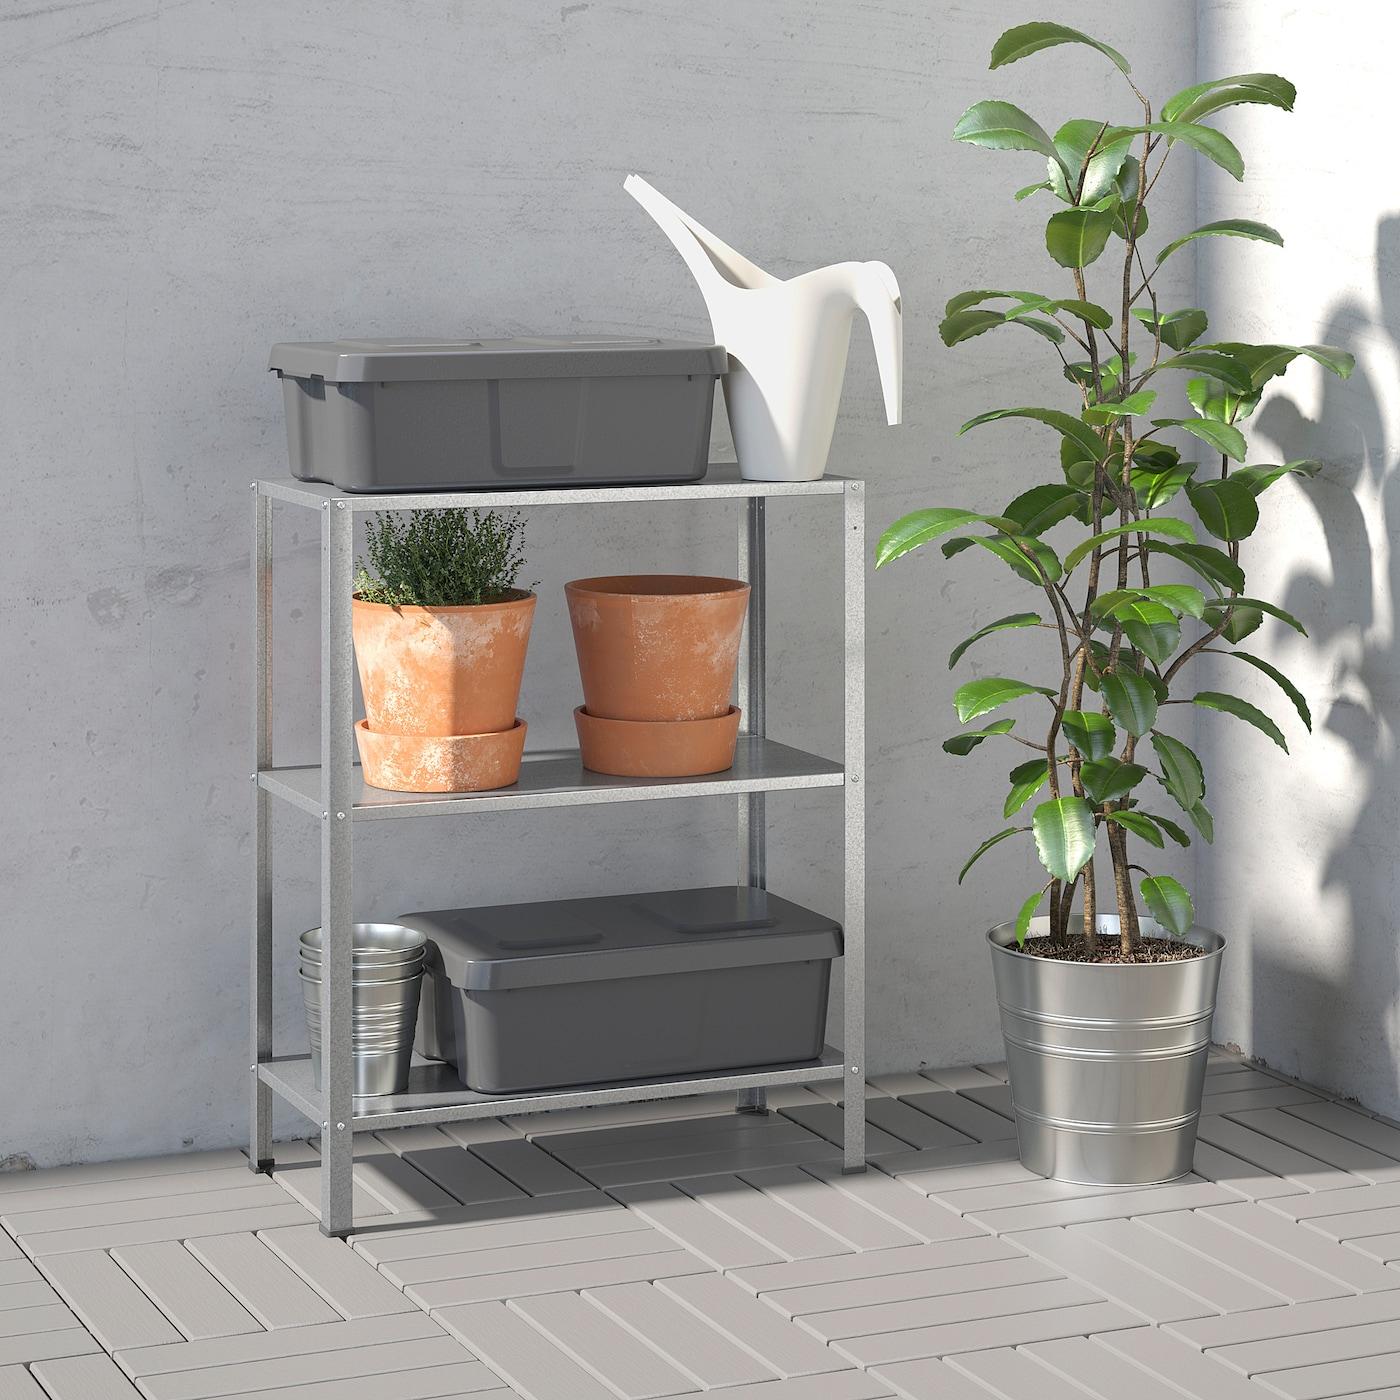 https://www.ikea.com/cz/en/images/products/hyllis-shelving-unit-in-outdoor__0911680_pe711416_s5.jpg